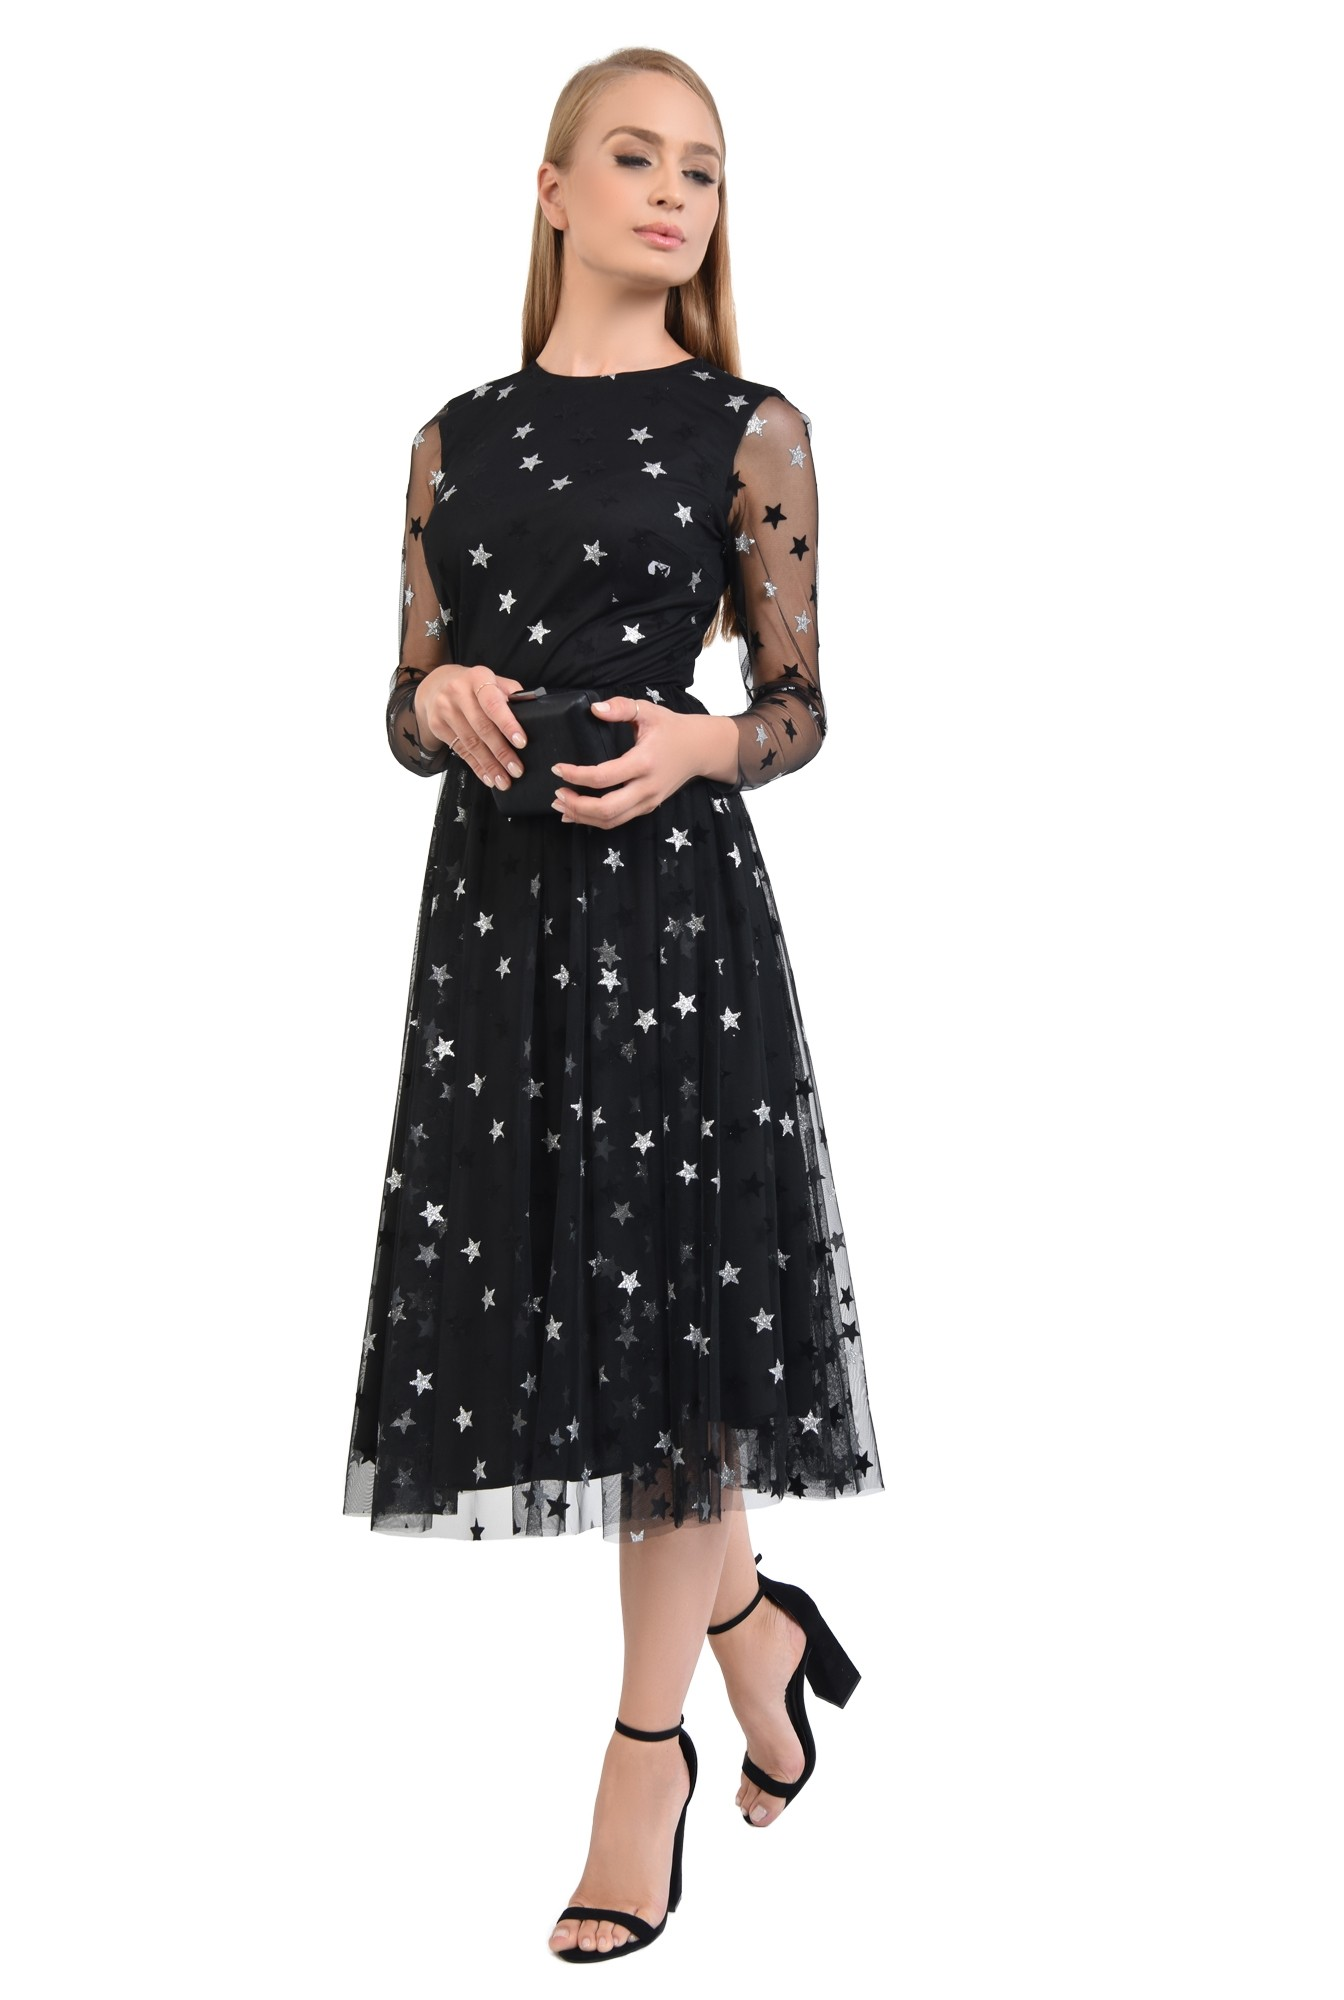 3 - 360 - rochie neagra, croi evazat, cusatura in talie, maneci lungi